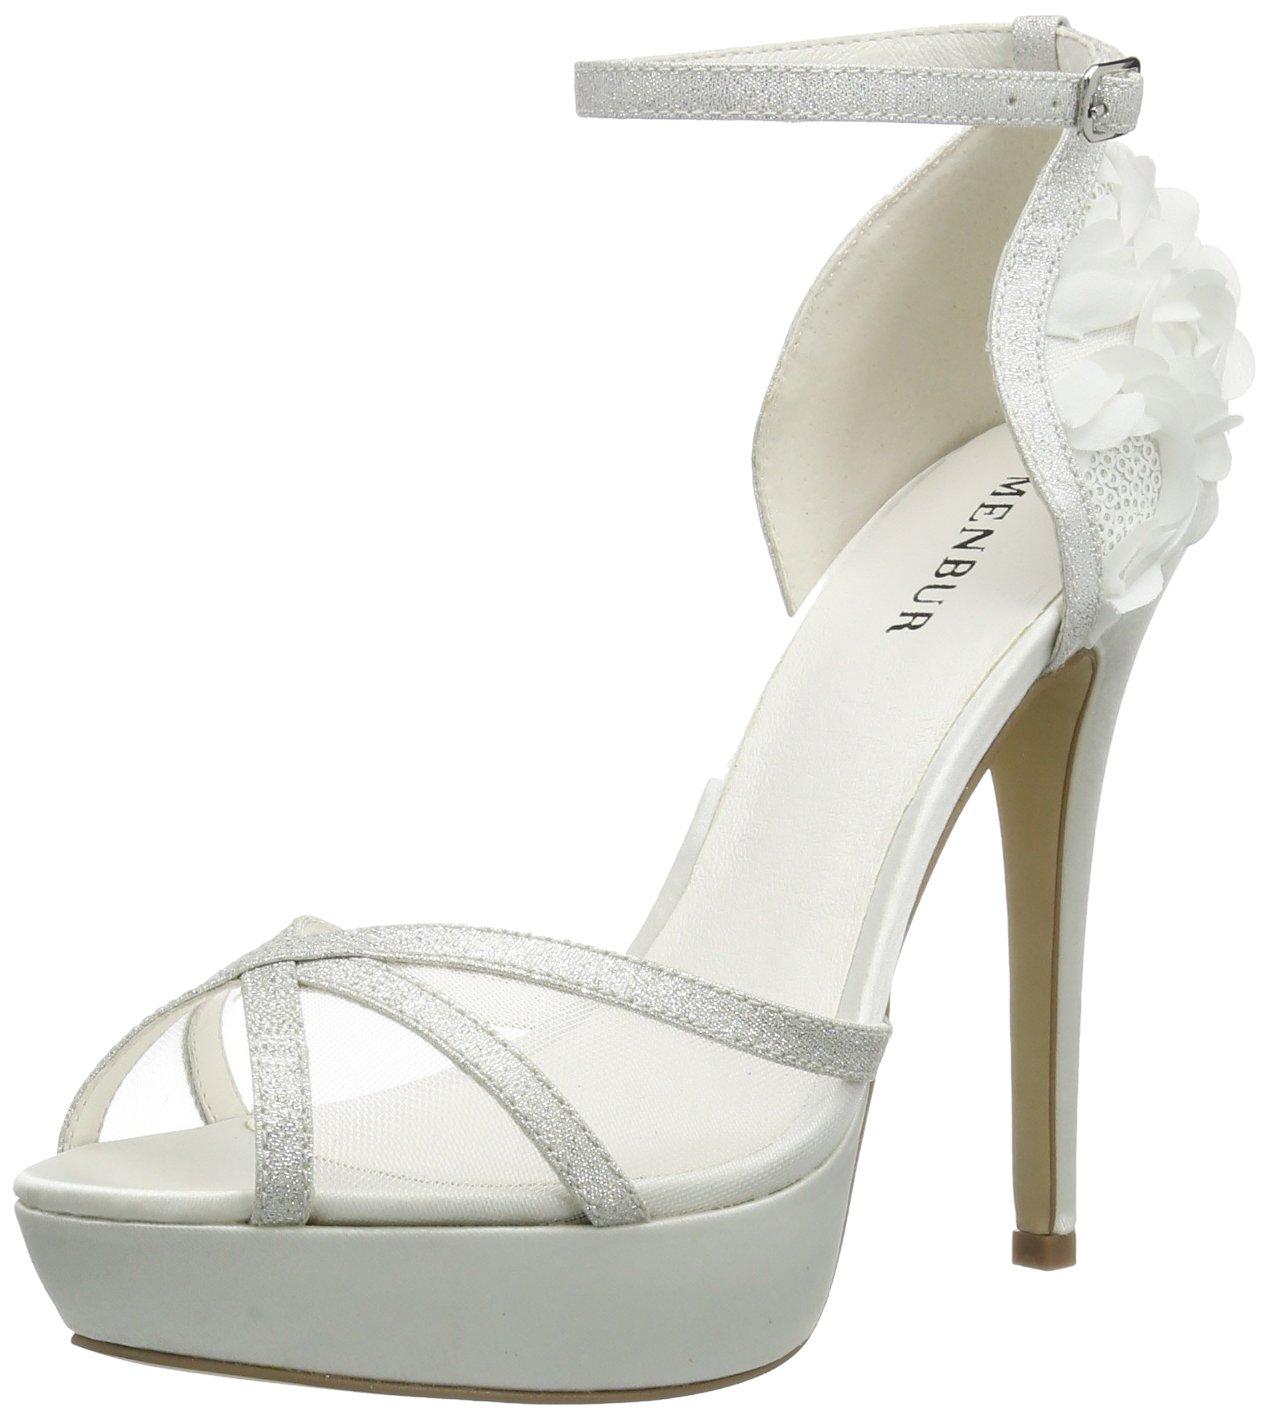 Menbur Wedding Blanc 15825 Iria, Sandales Plateau Femme Blanc - Iria, Elfenbein (Ivory 04) 93642d8 - automaticcouplings.space